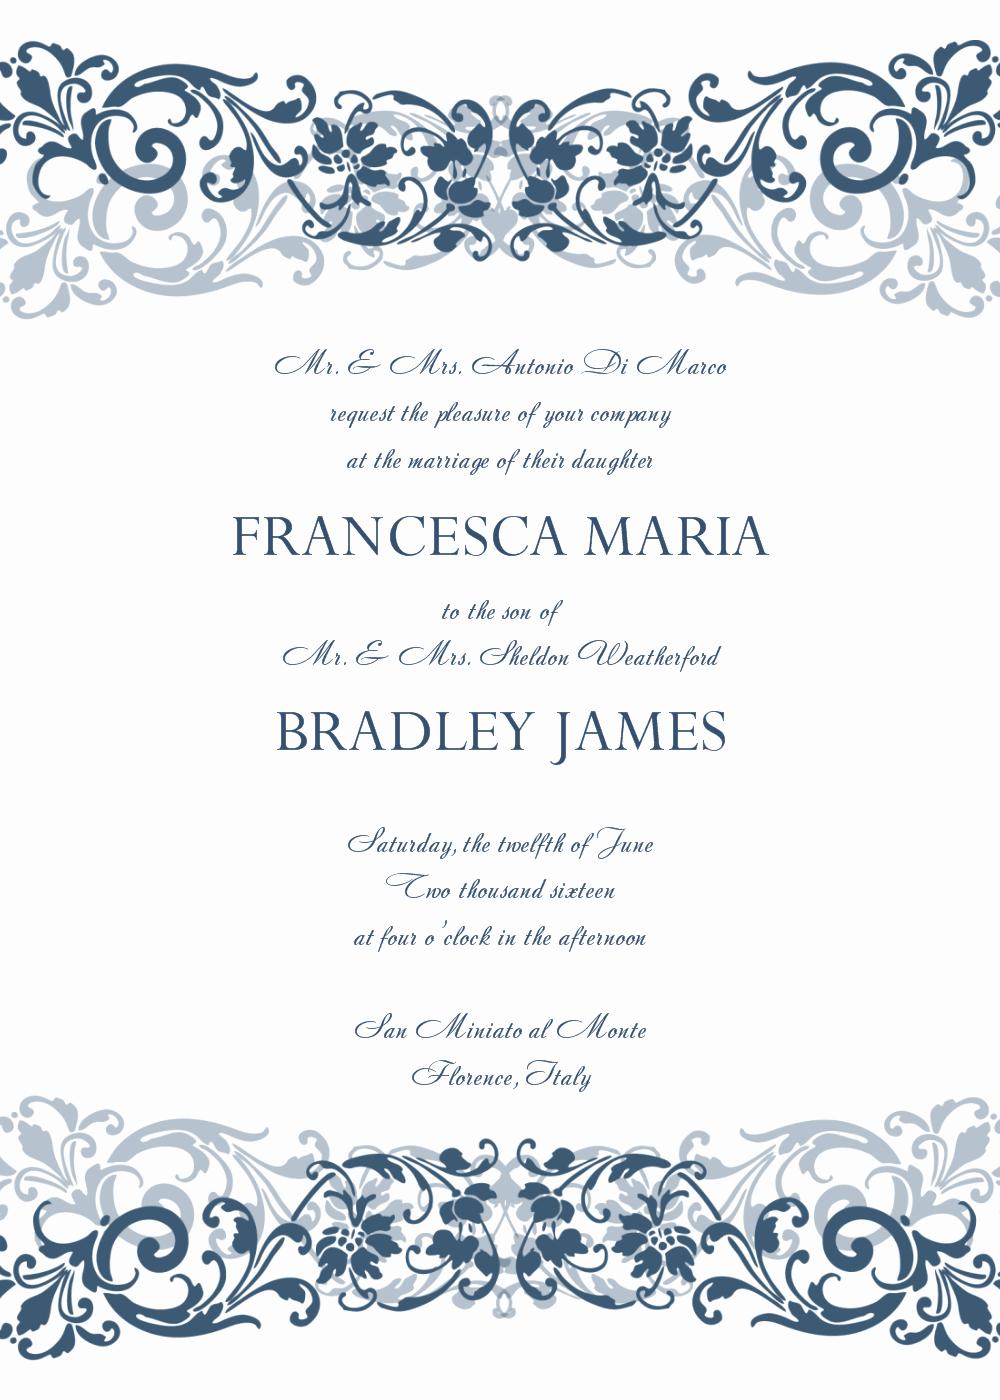 Microsoft Office Wedding Invitation Template Fresh 6 Wedding Invitation Templates Word Excel Pdf Templates